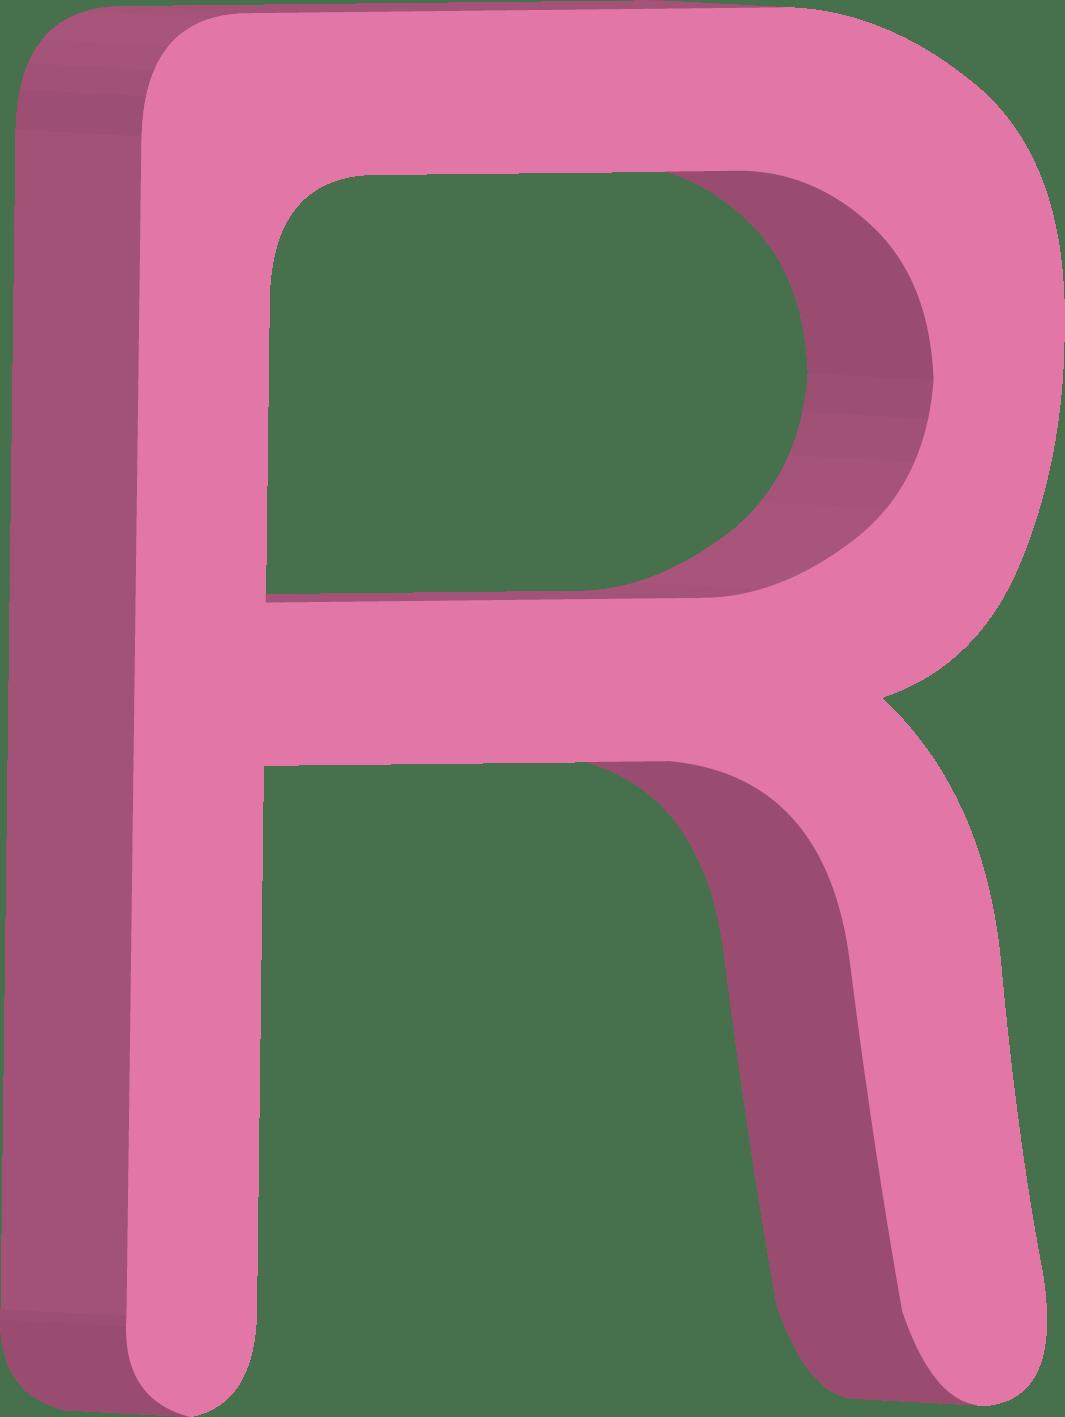 English Clipart English Alphabet English English Alphabet